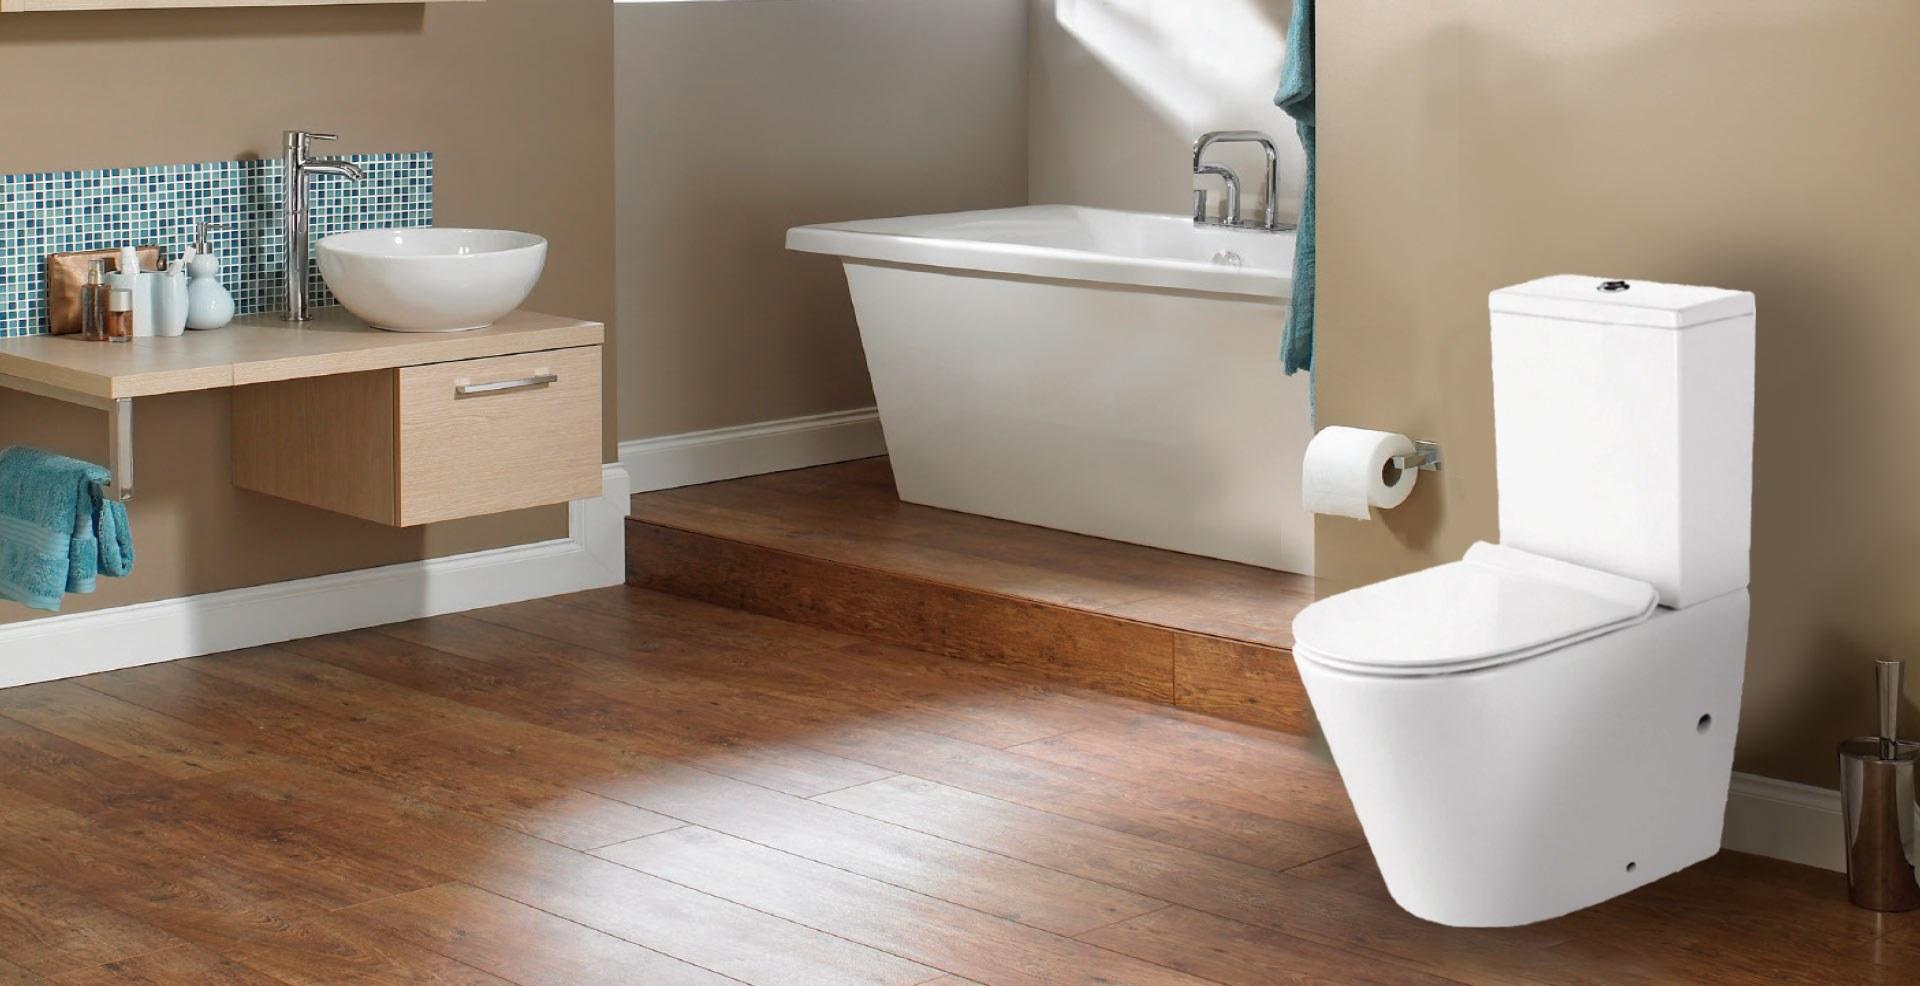 Prestige BTW Rimless Toilet Suite